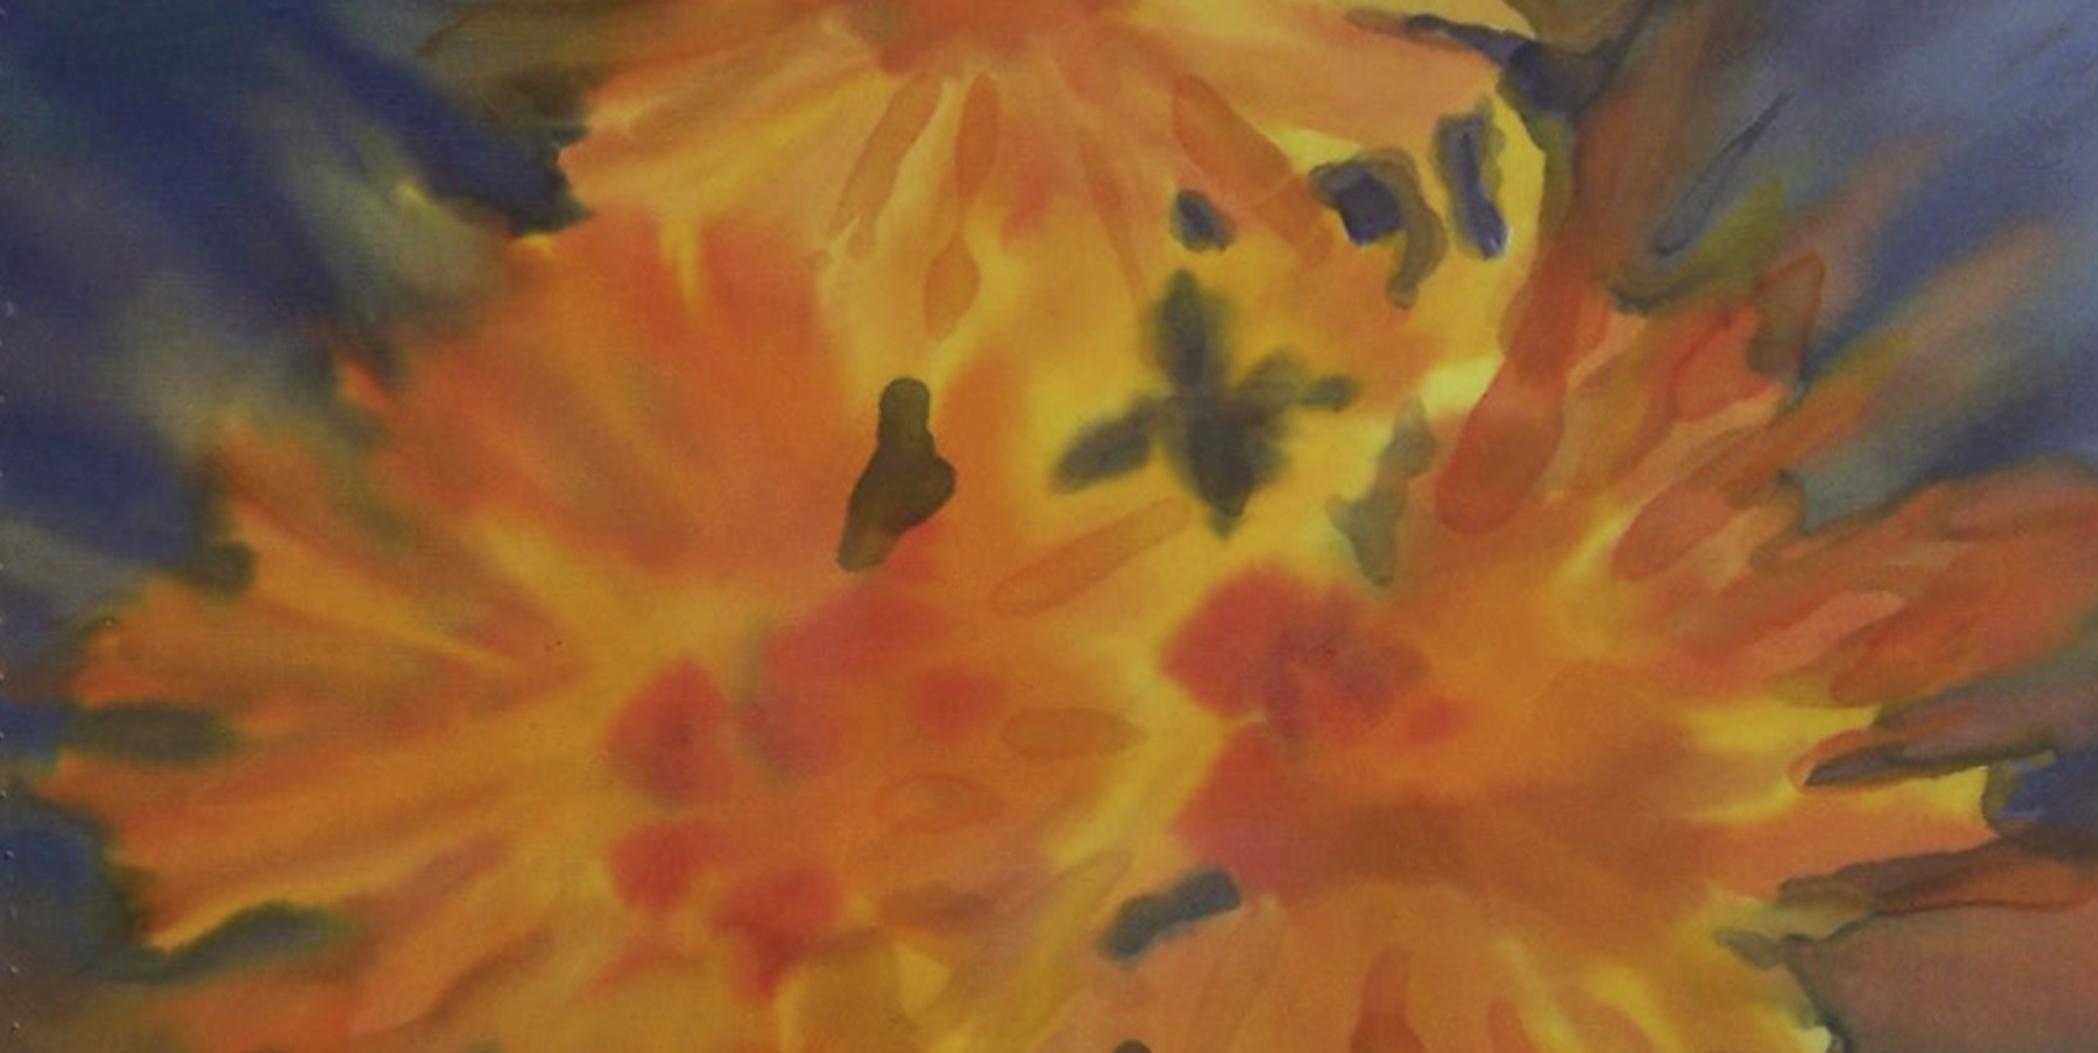 helios - acuarela en seda 25 x 25 cm. detalle